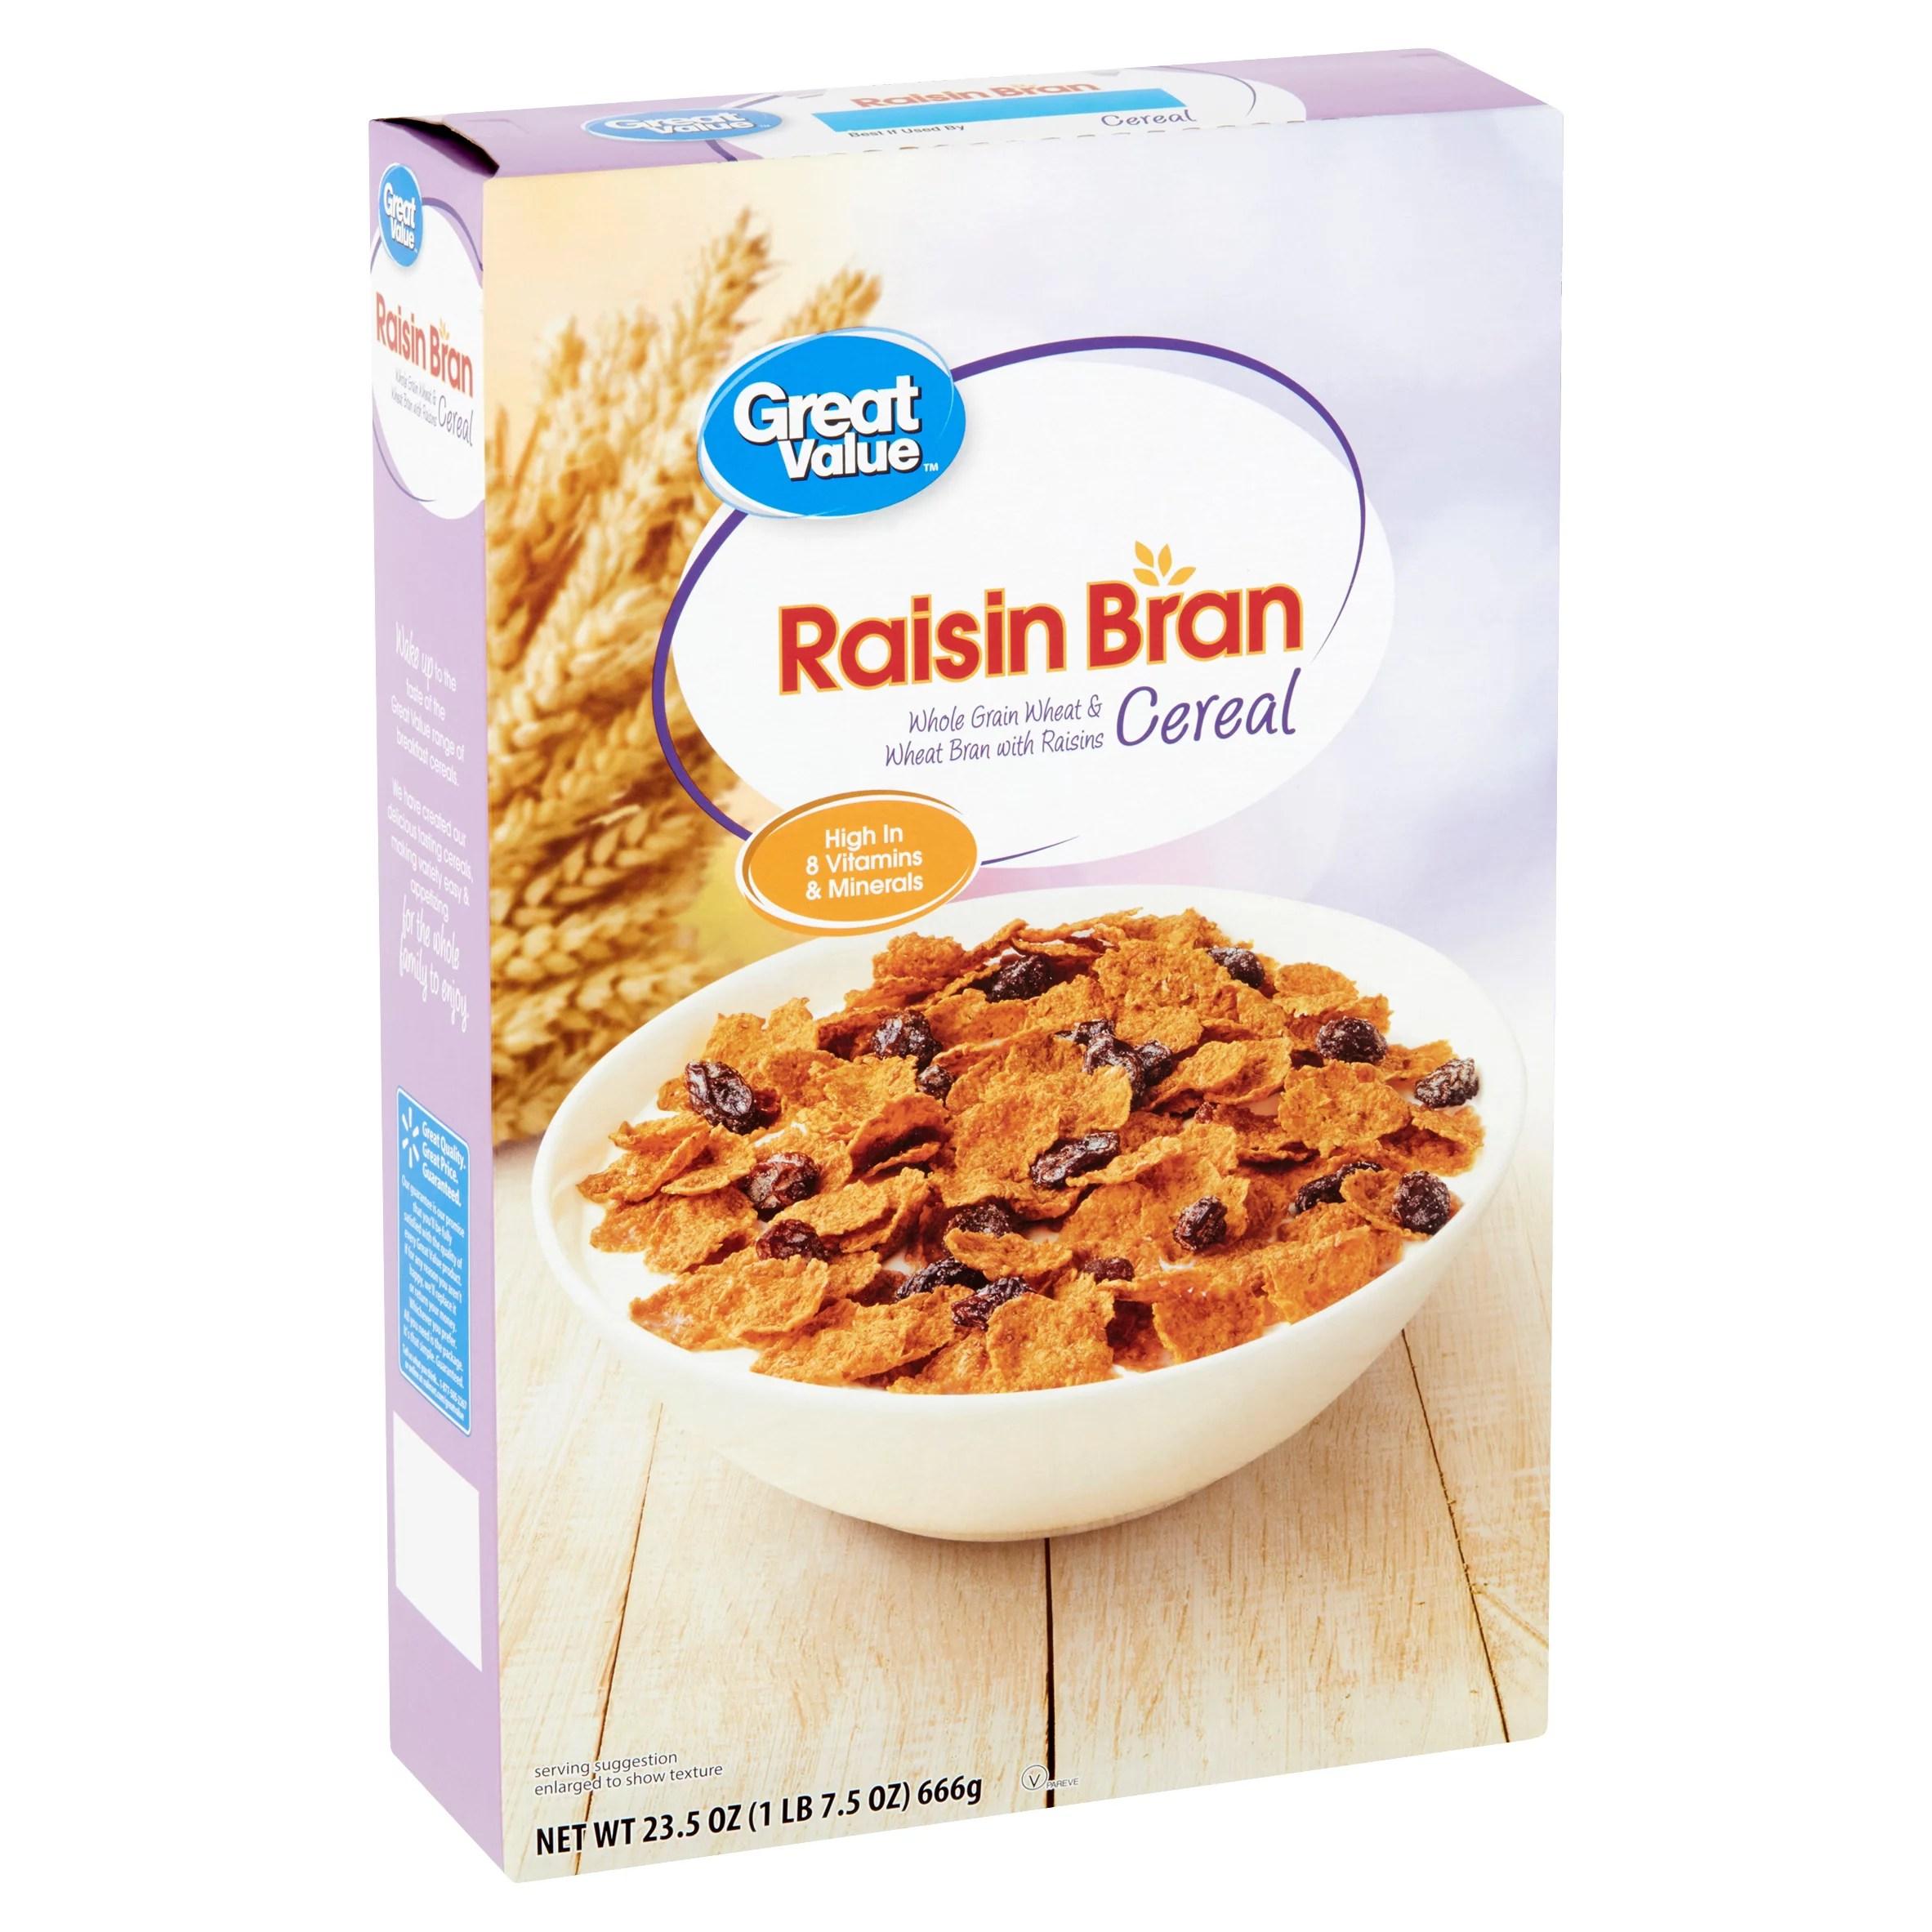 Great Value Raisin Bran Cereal 23.5 oz - Walmart.com ...